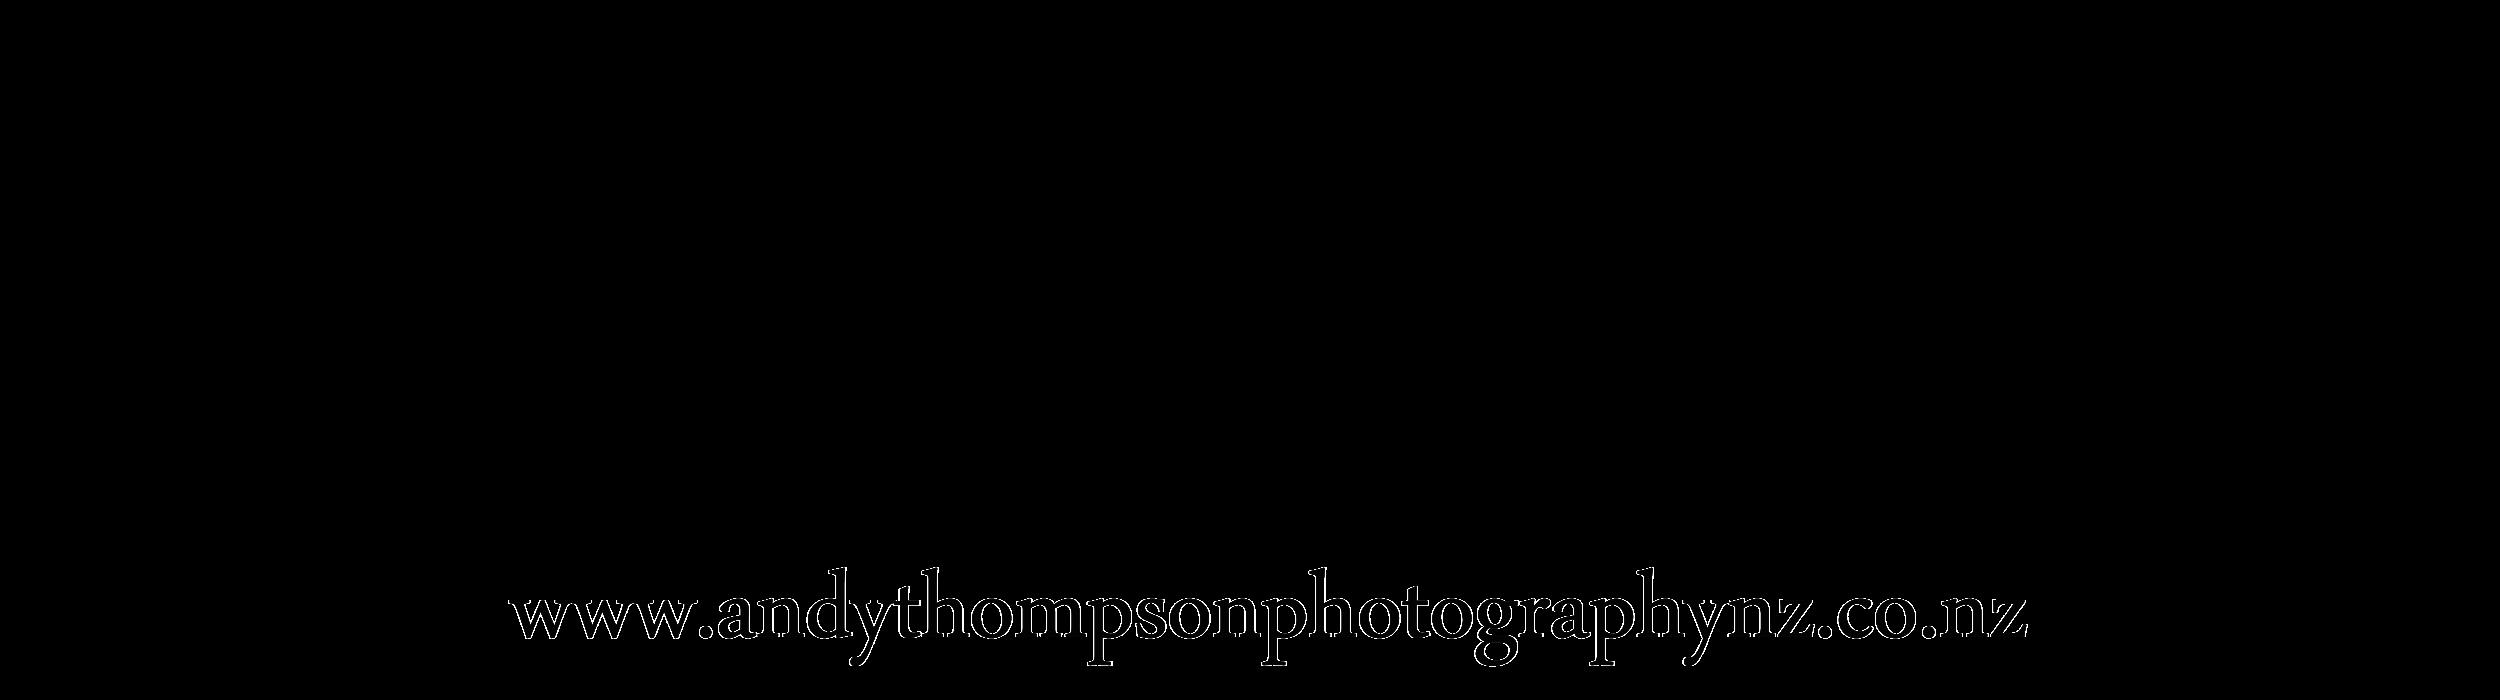 Andy-Thompson logo-black.png